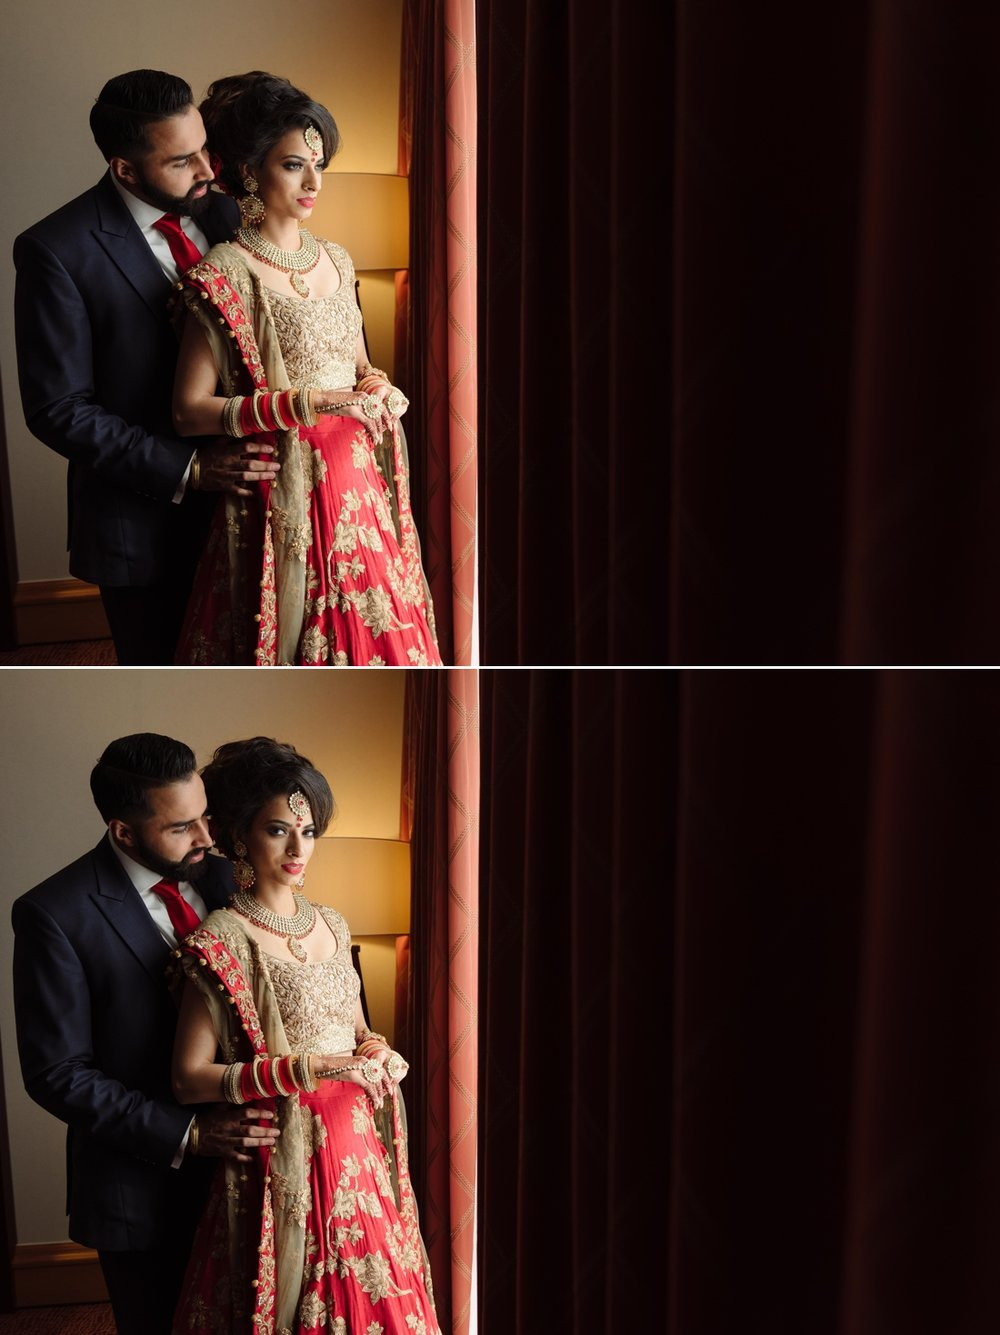 Gurpreet and Nick Sikh Wedding 2 - Southampton - Photos by Abhi 59.jpg